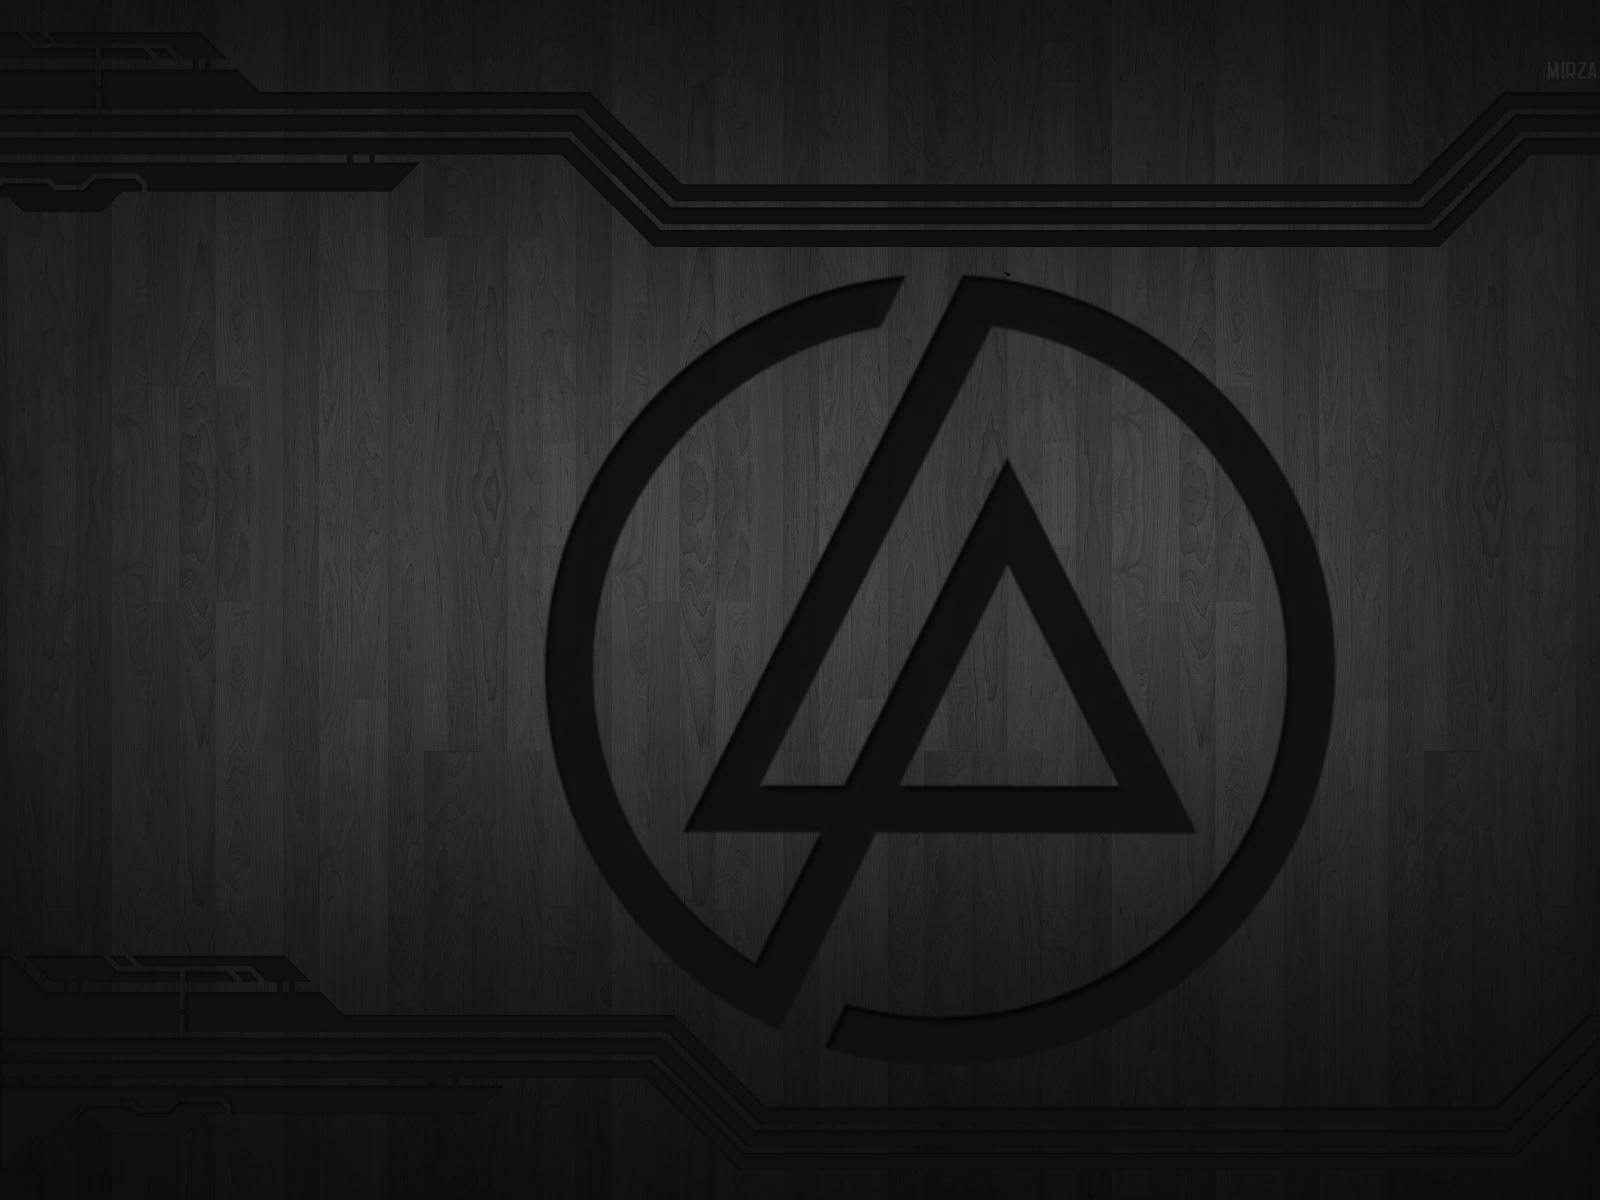 Linkin Park Logo Wallpapers Hd Wallpaper Cave